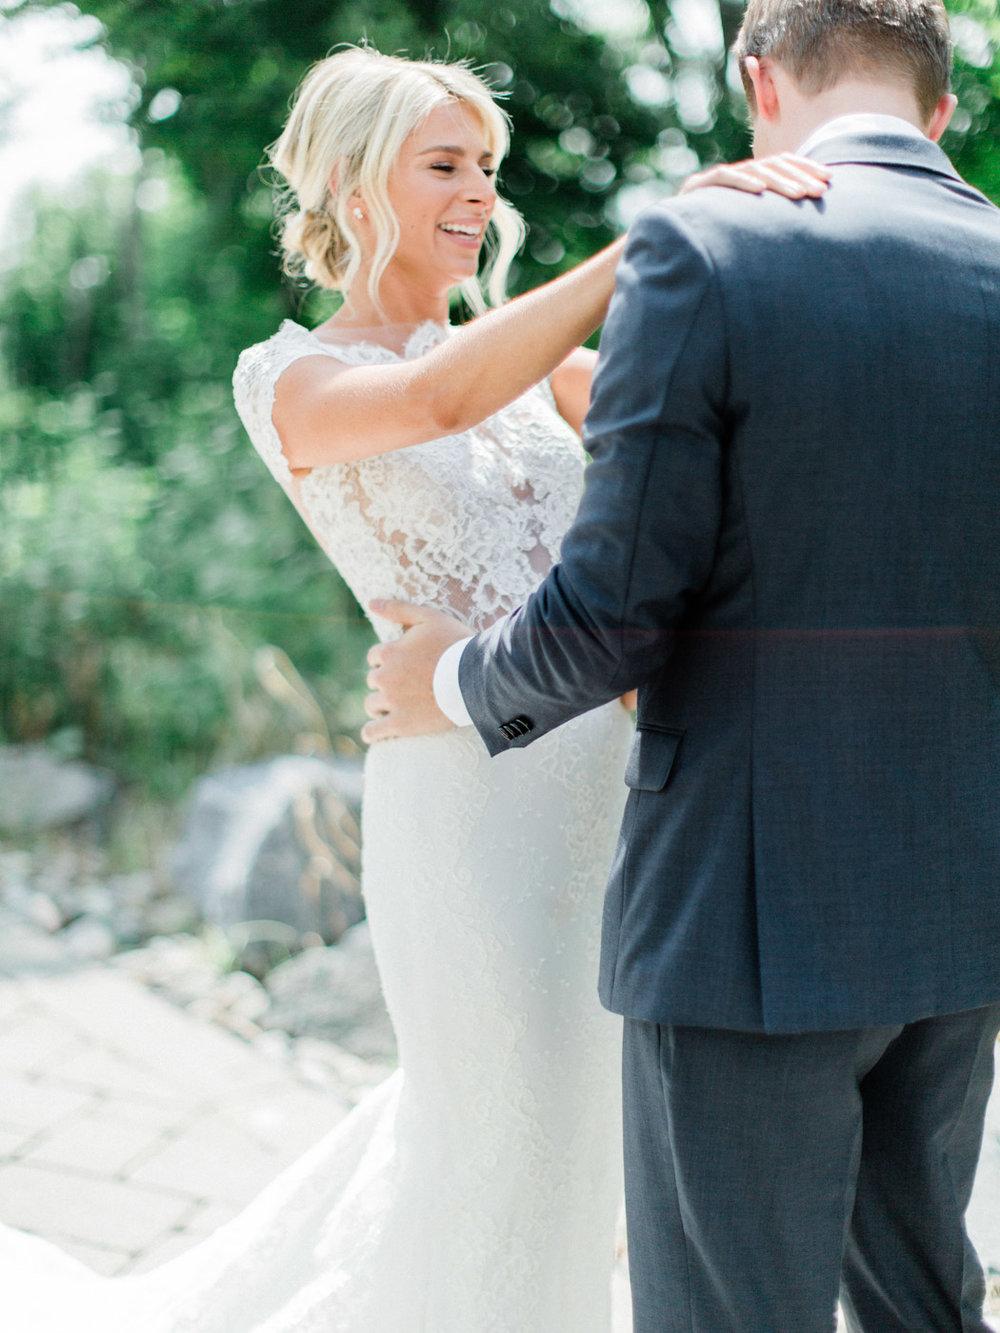 Toronto-Muskoka-wedding-photographer-summery-fun-documentary-the-marriott-rosseau33.jpg